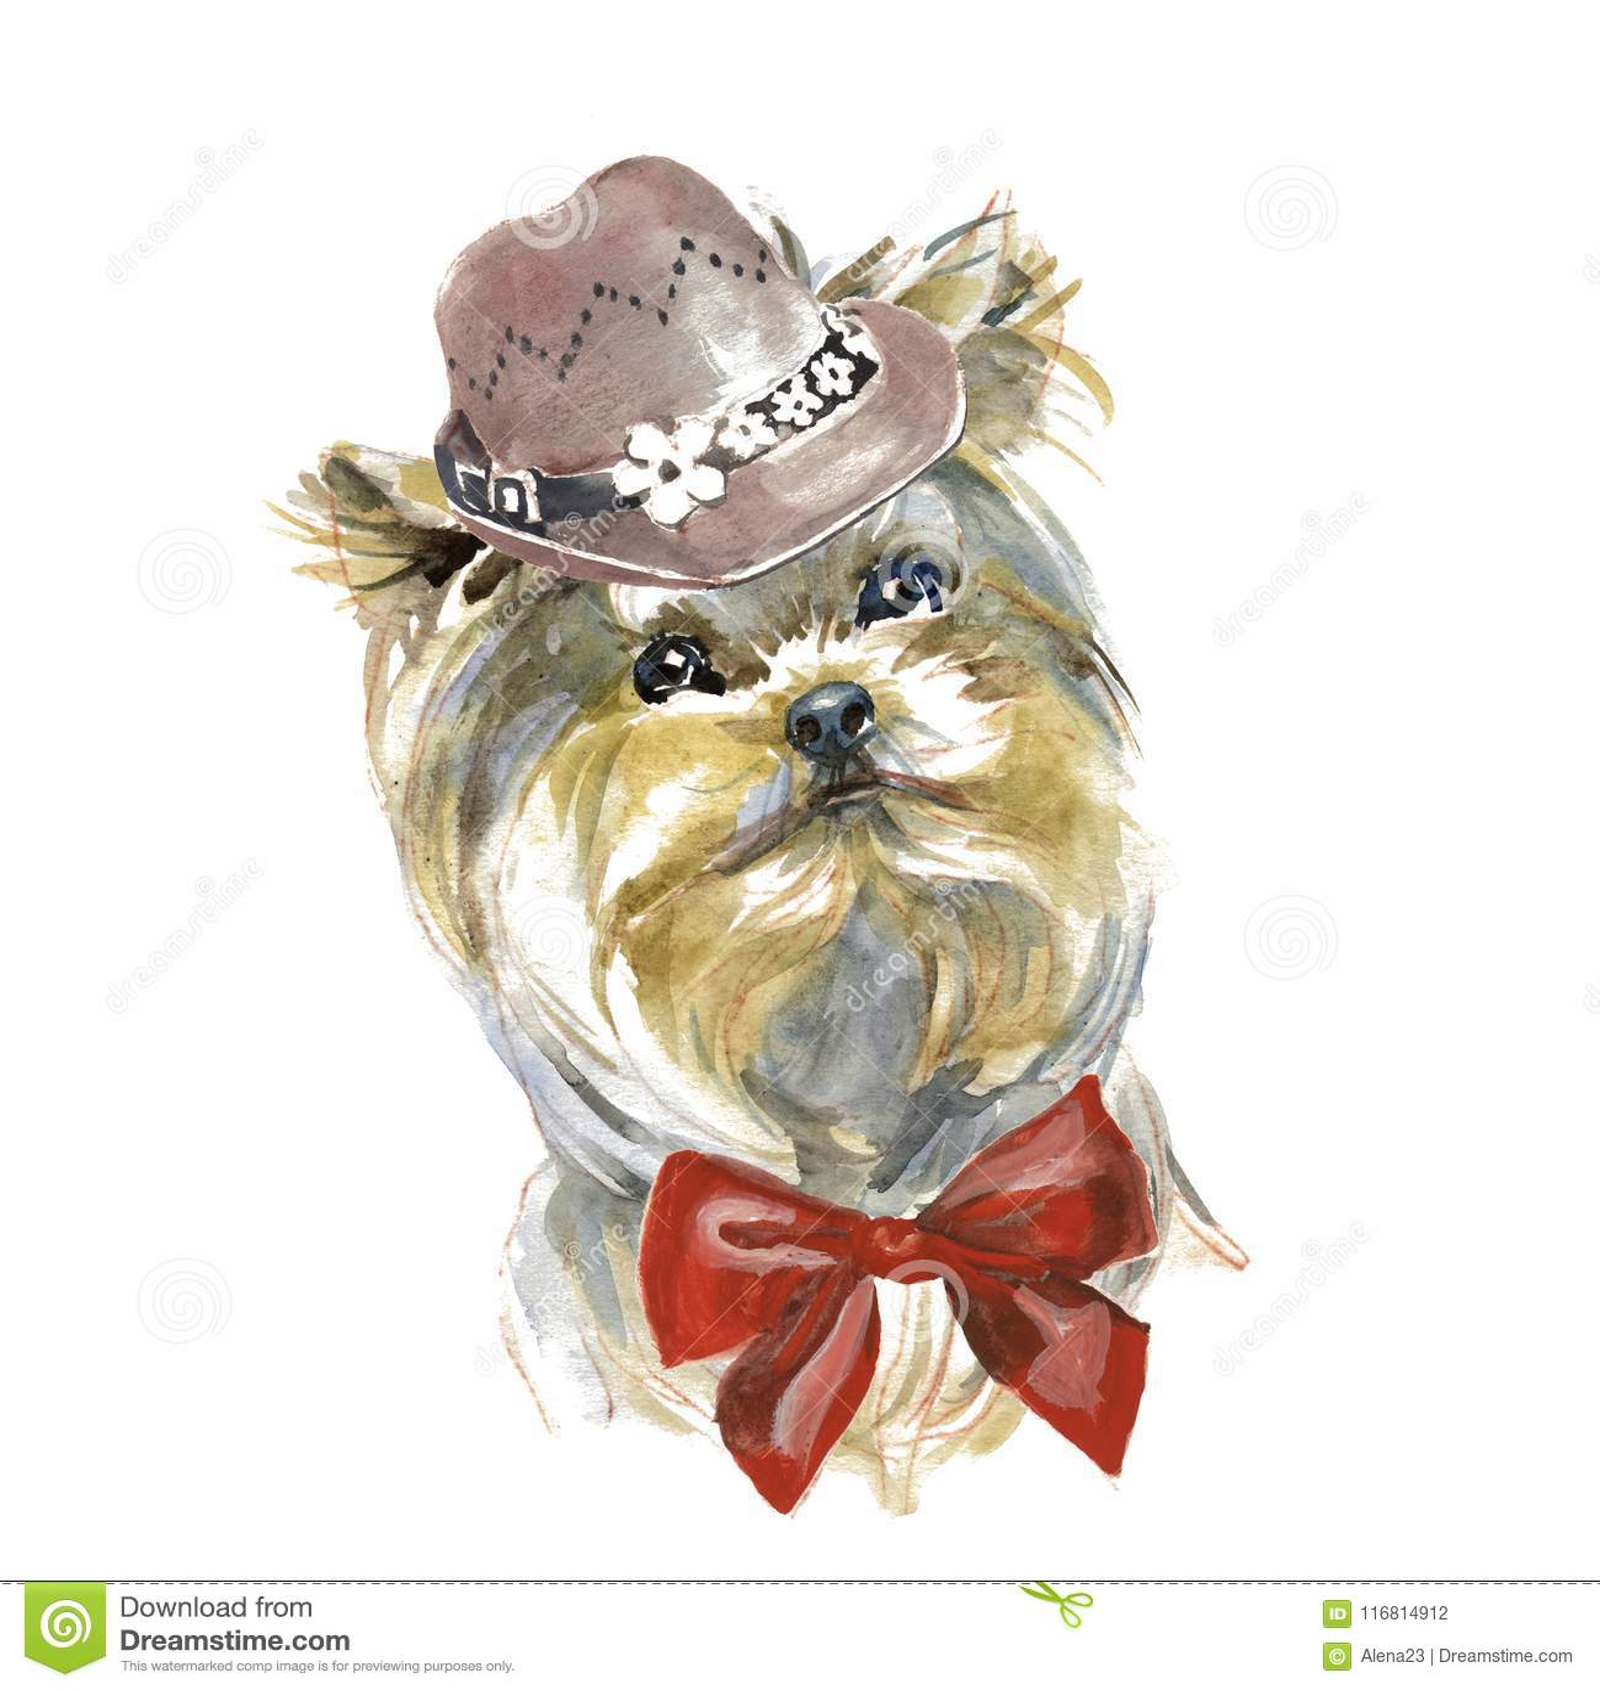 Yorkshire terrier - dipinto a mano, isolato su fondo bianco w